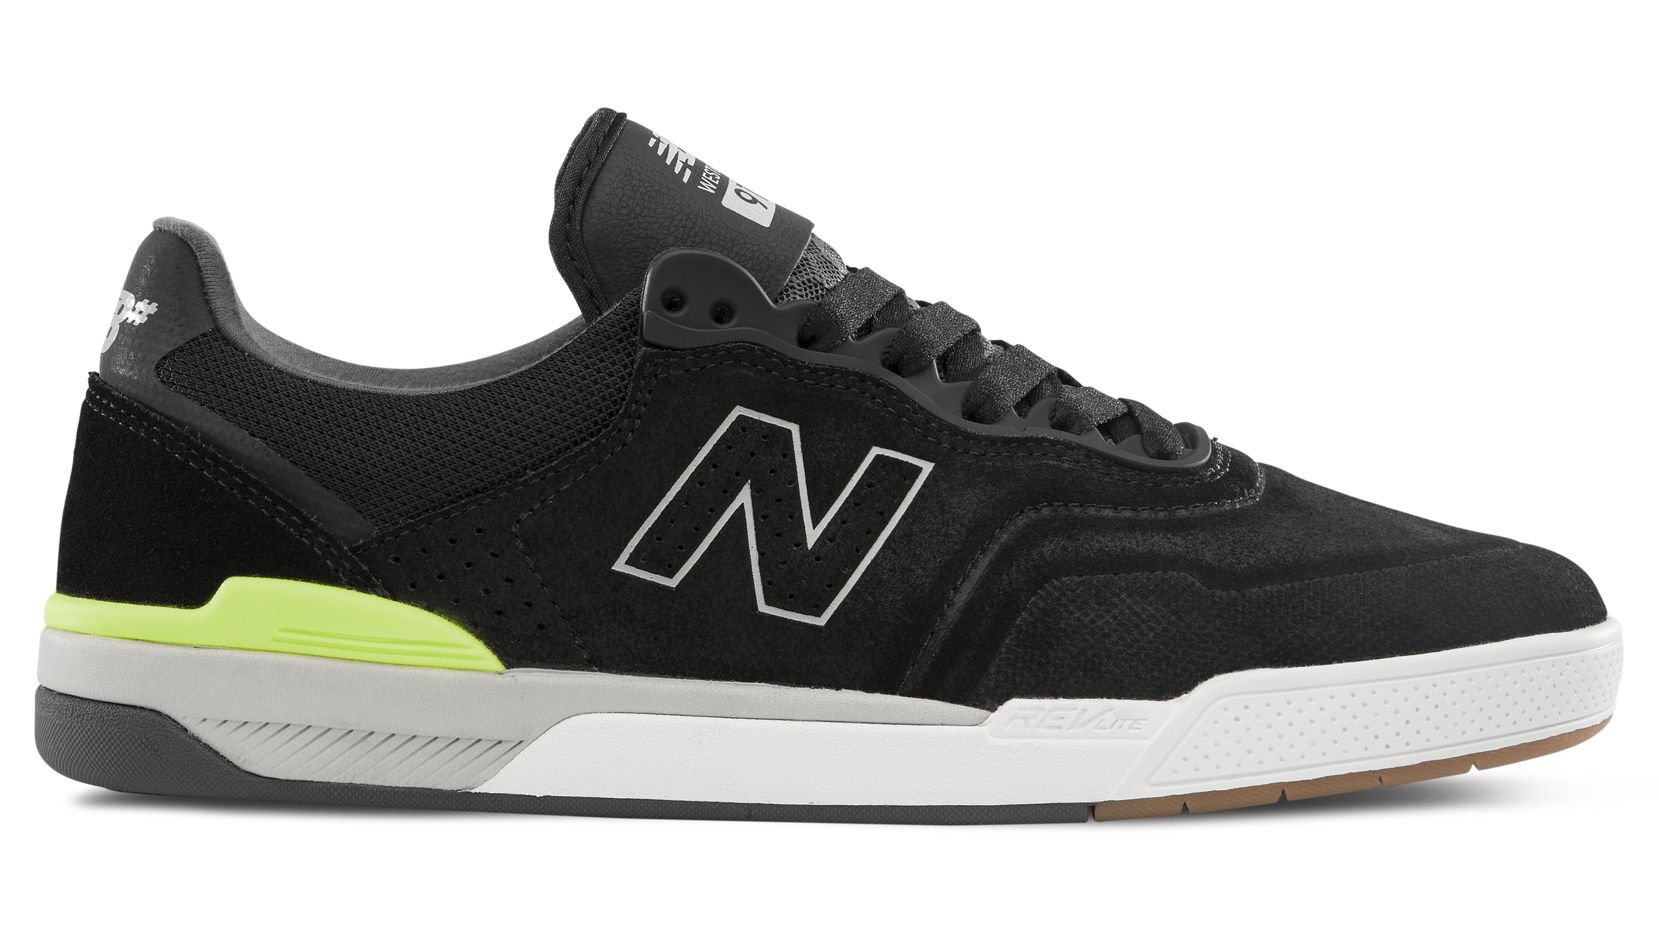 New Balance Numeric 913 Westgate black/grey/lime